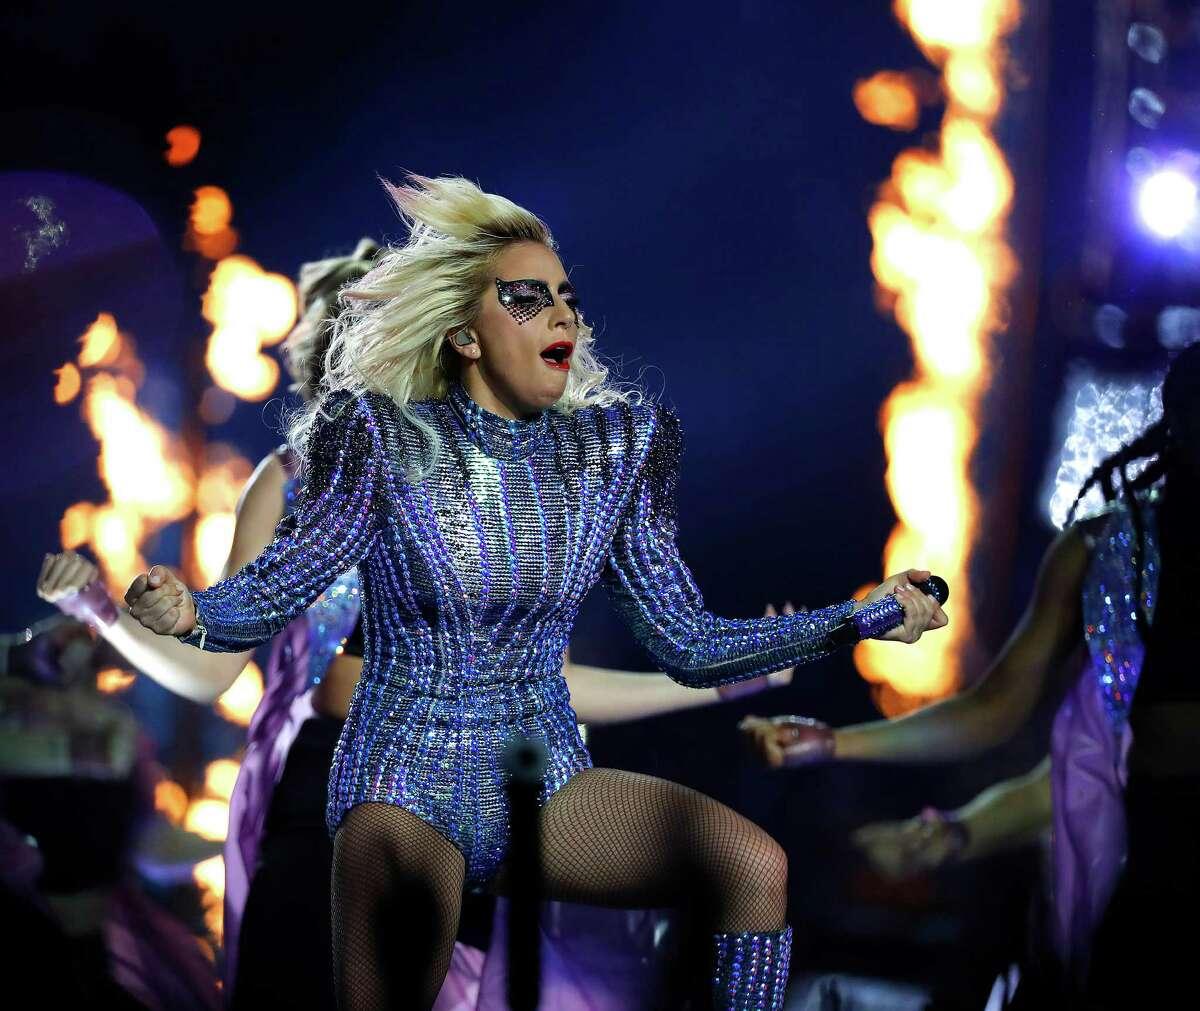 Lady Gaga performs during halftime of Super Bowl LI at NRG Stadium on Sunday, February 5, 2017.